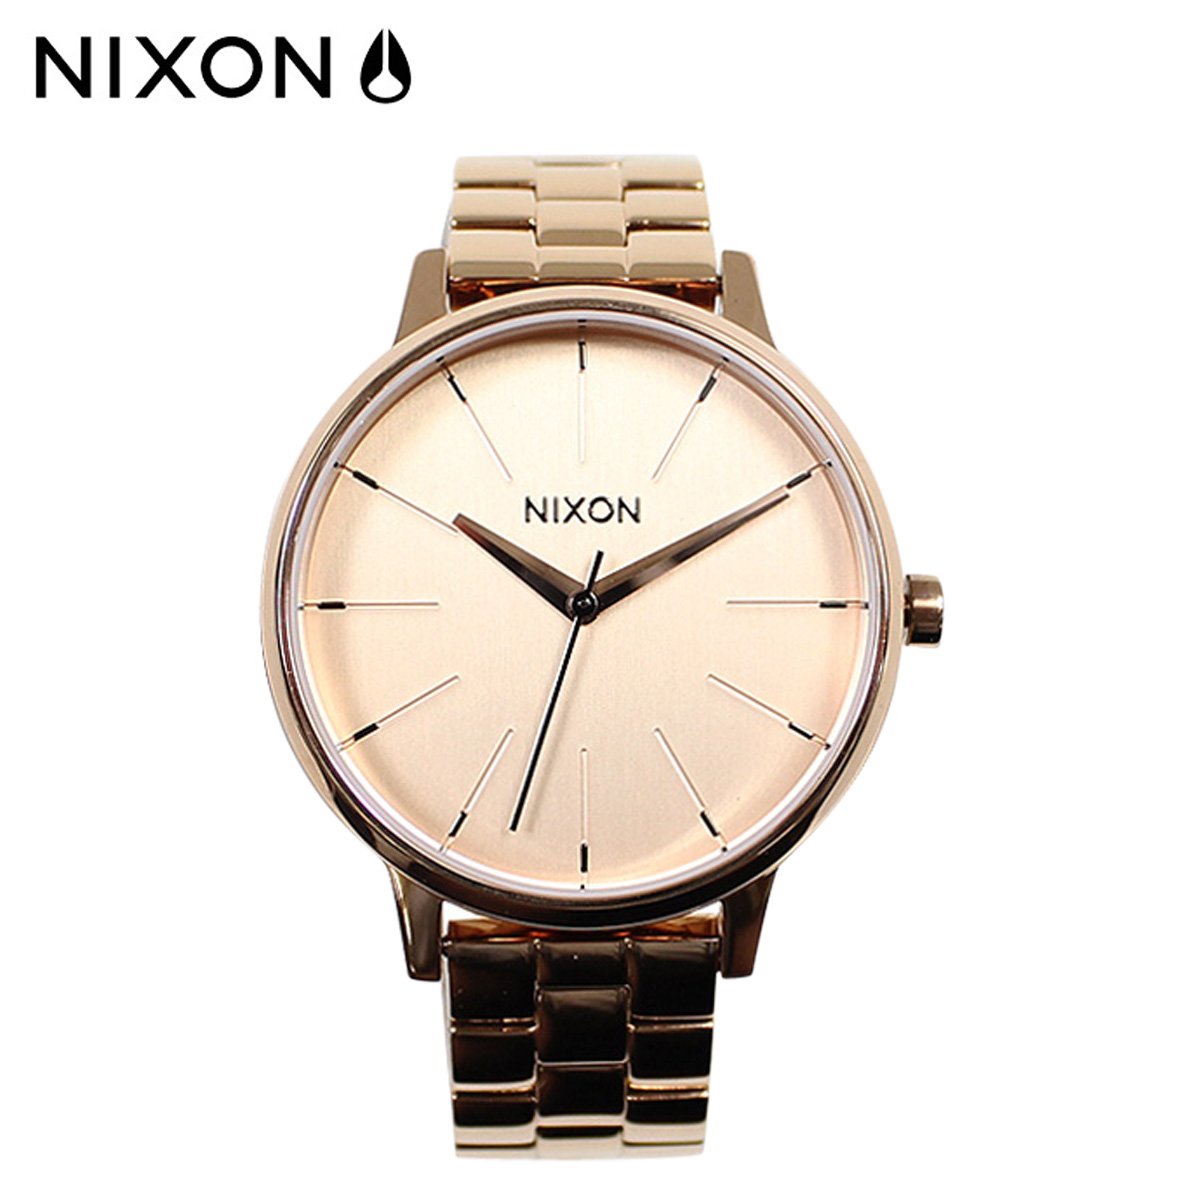 NIXON ニクソン 腕時計 36mm ウォッチ 時計 A099 オールローズゴールド KENSINGTON メンズ レディース